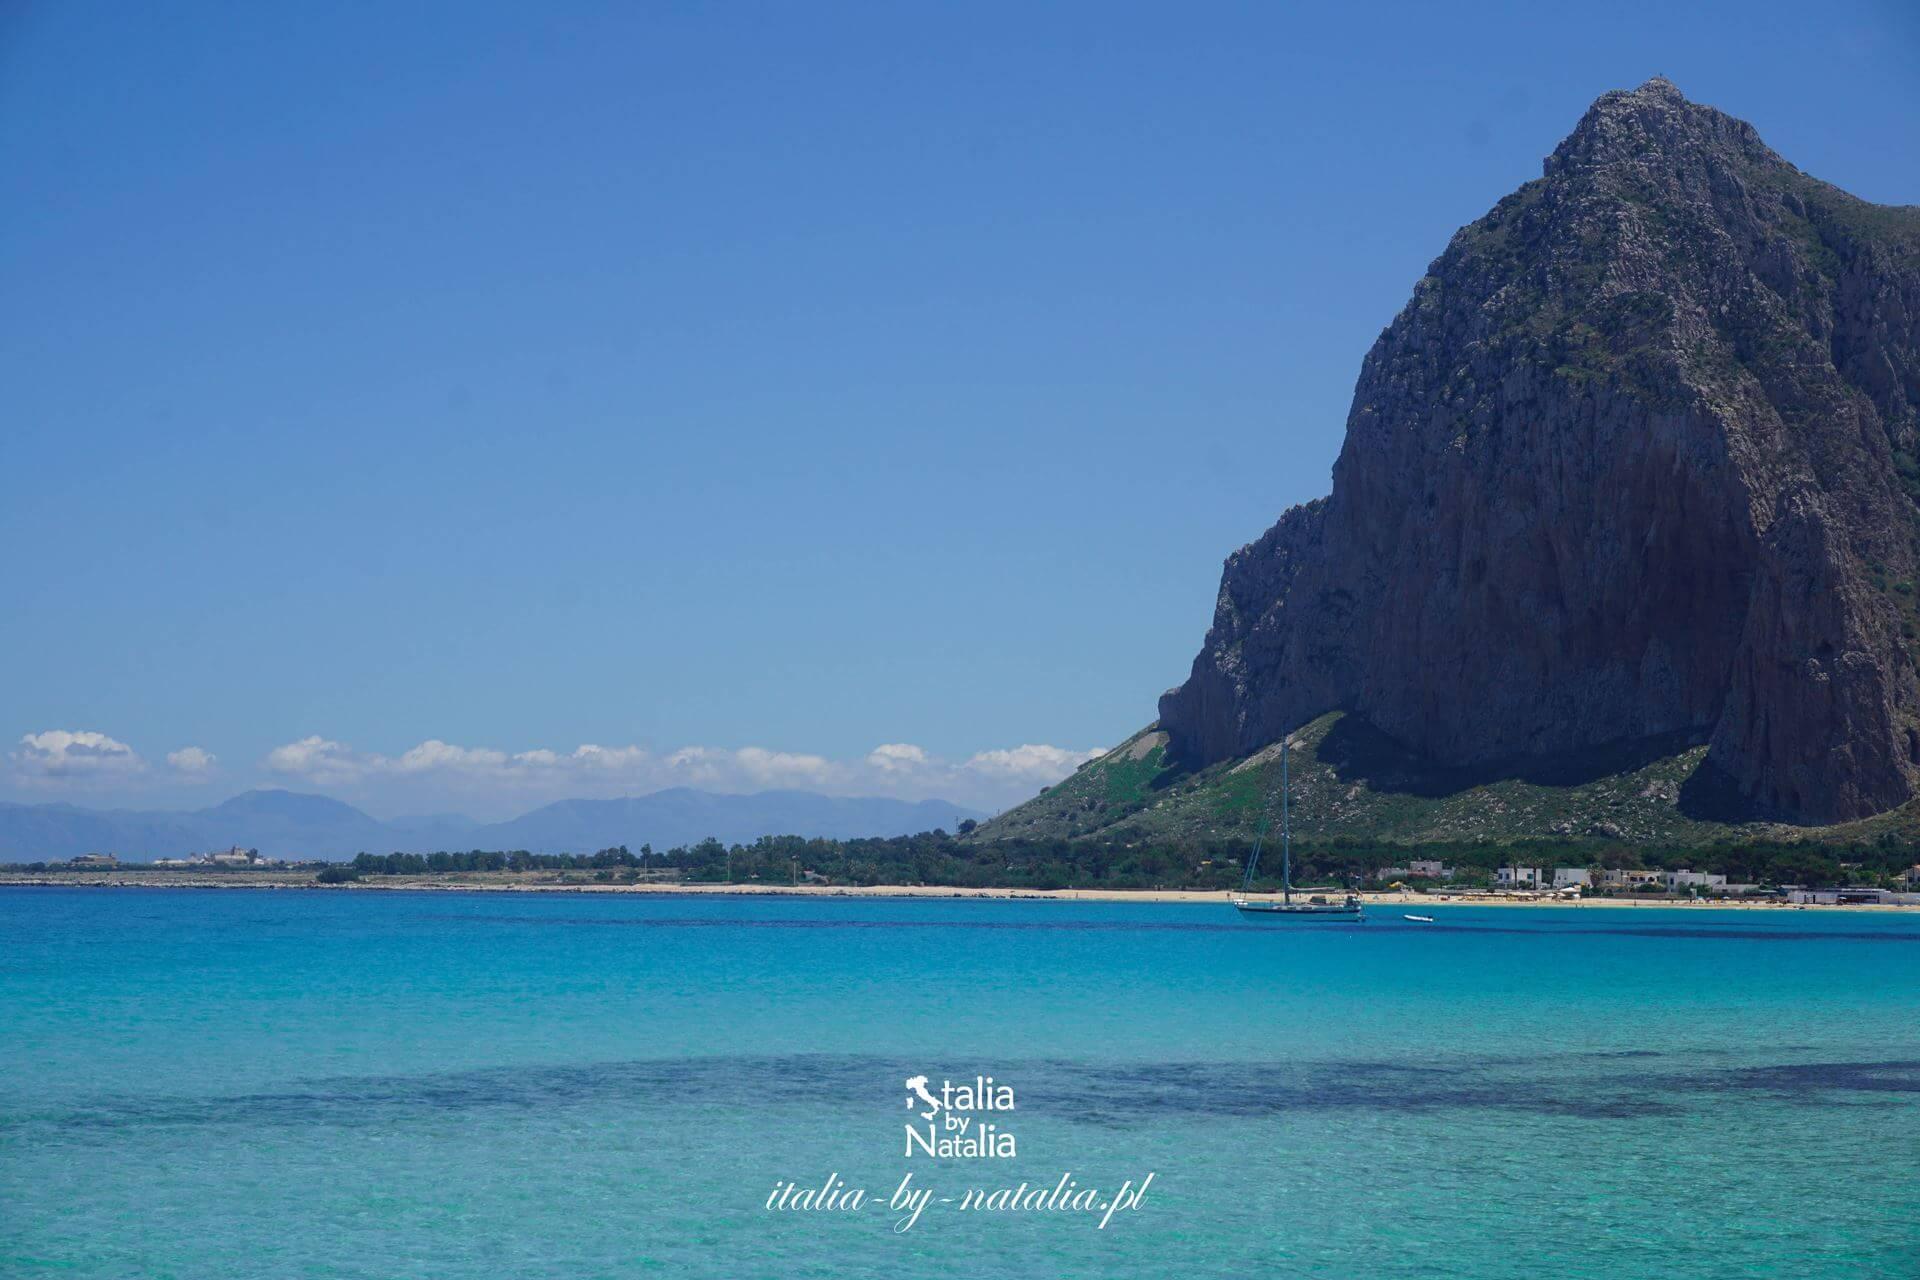 San Vito lo Capo najpiękniejsza plaża Sycylii rejs do Zingaro Scopello atrakcje